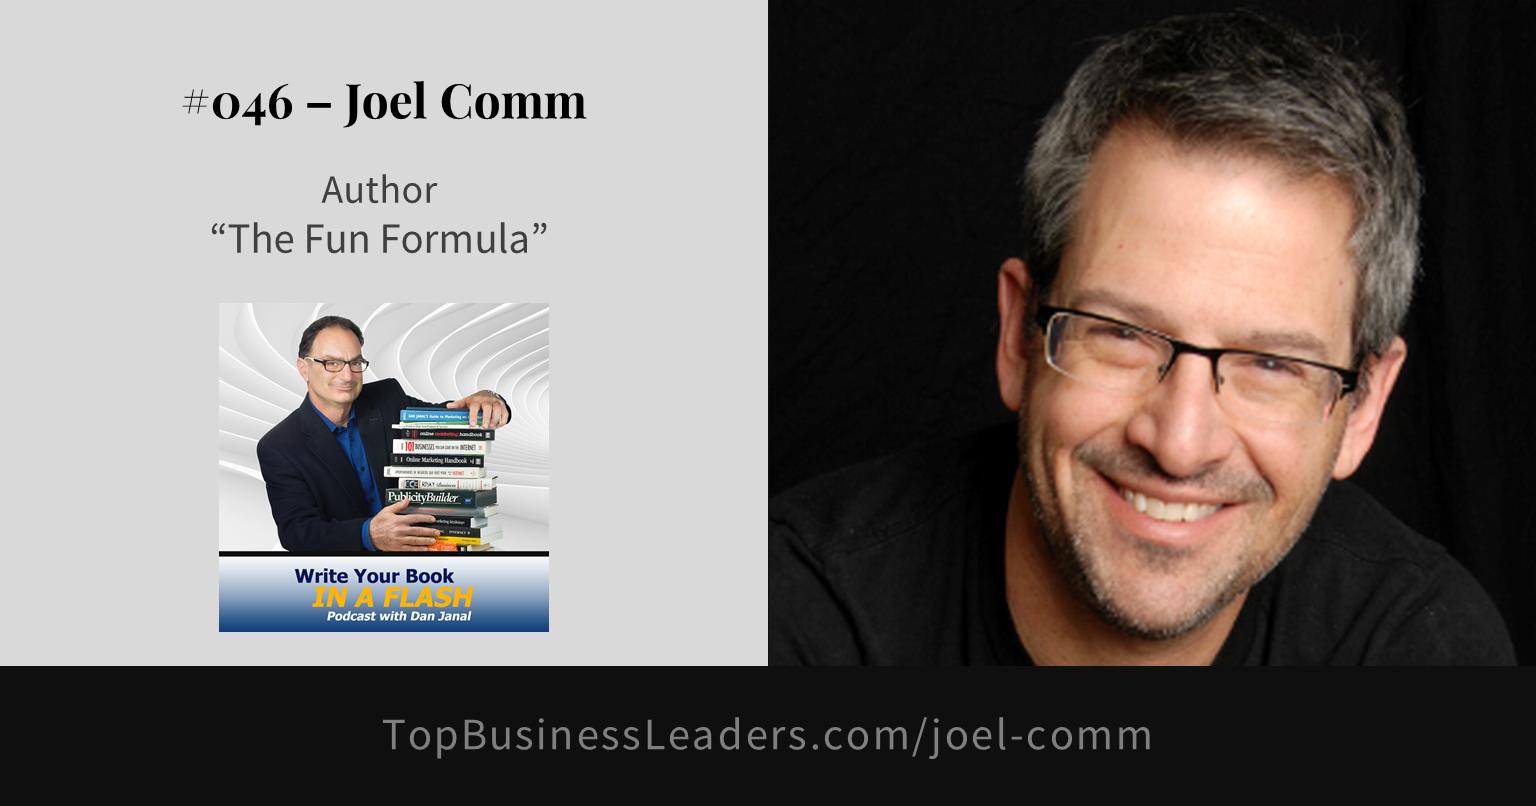 joel-comm-author-the-fun-formula